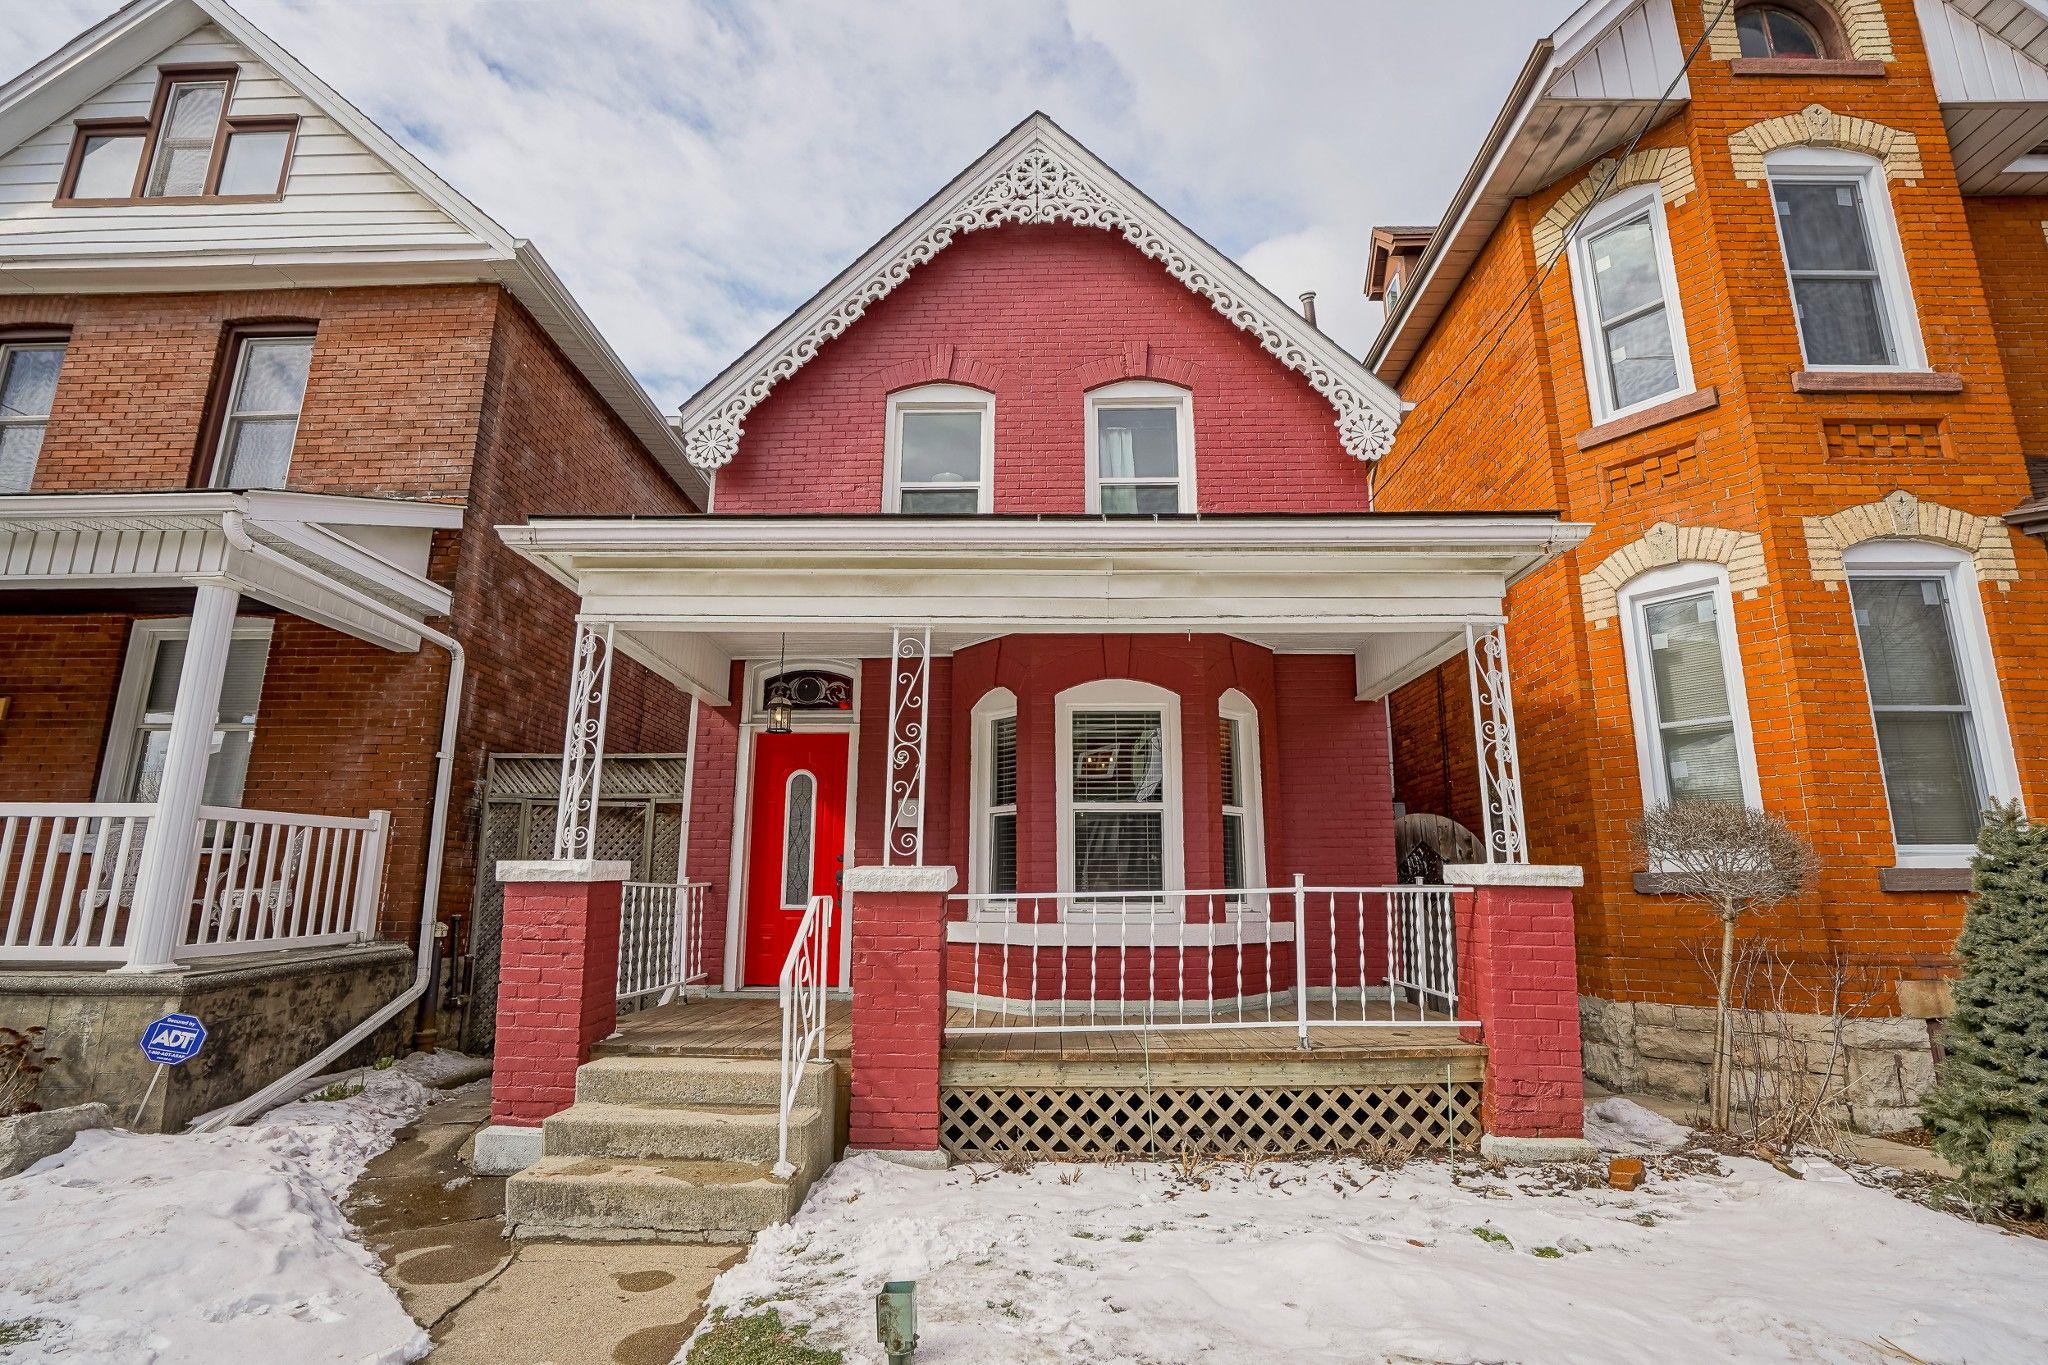 Main Photo: 57 Oak Avenue in Hamilton: House for sale : MLS®# H4047059